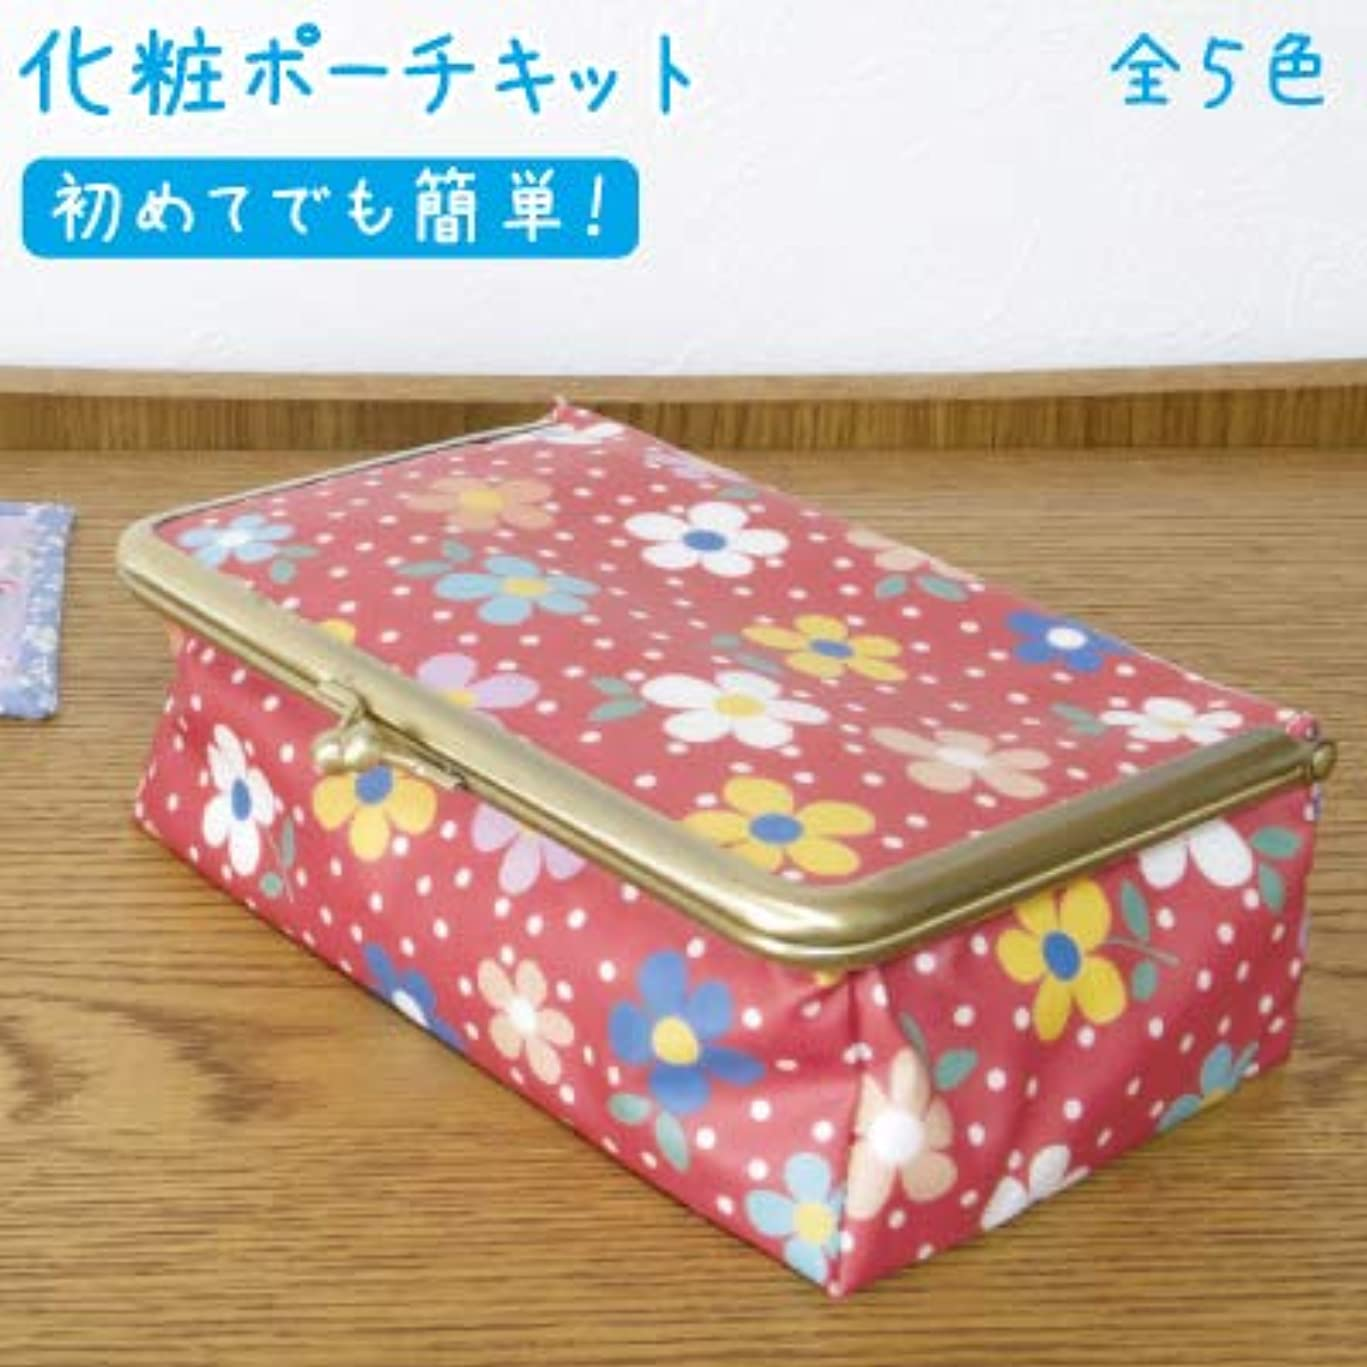 【INAZUMA】 がま口 化粧ポーチのキット 鏡付き CK-122AG #16ピンク×薄ピンク